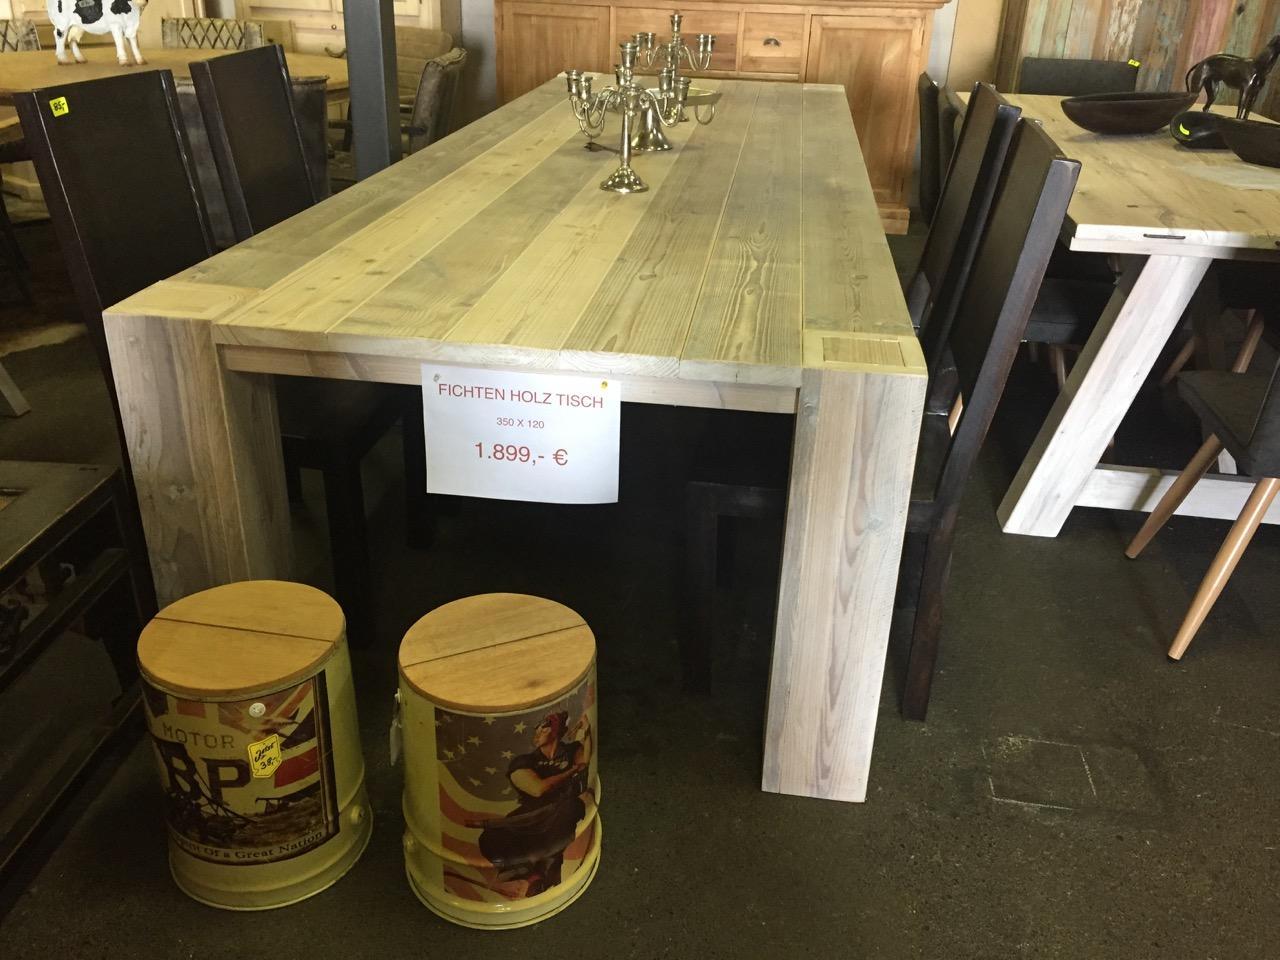 Fischtenholz tisch 350 x 100 teakshop llucmajor for Dekoartikel aus holland